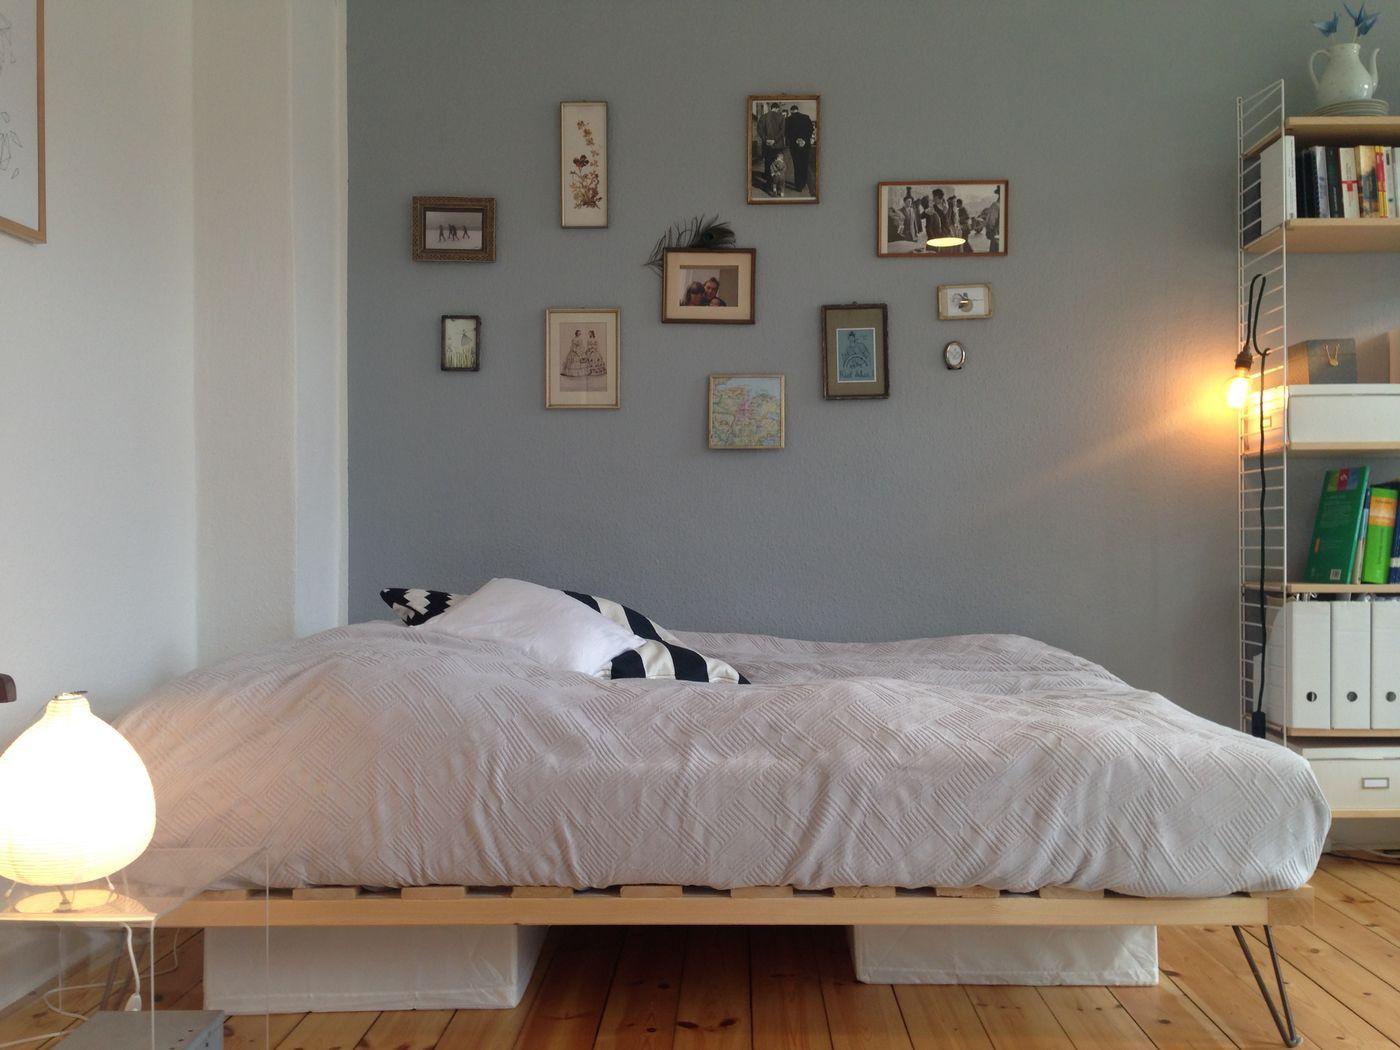 Diy Betten  DIY Möbel selber bauen Seite 3